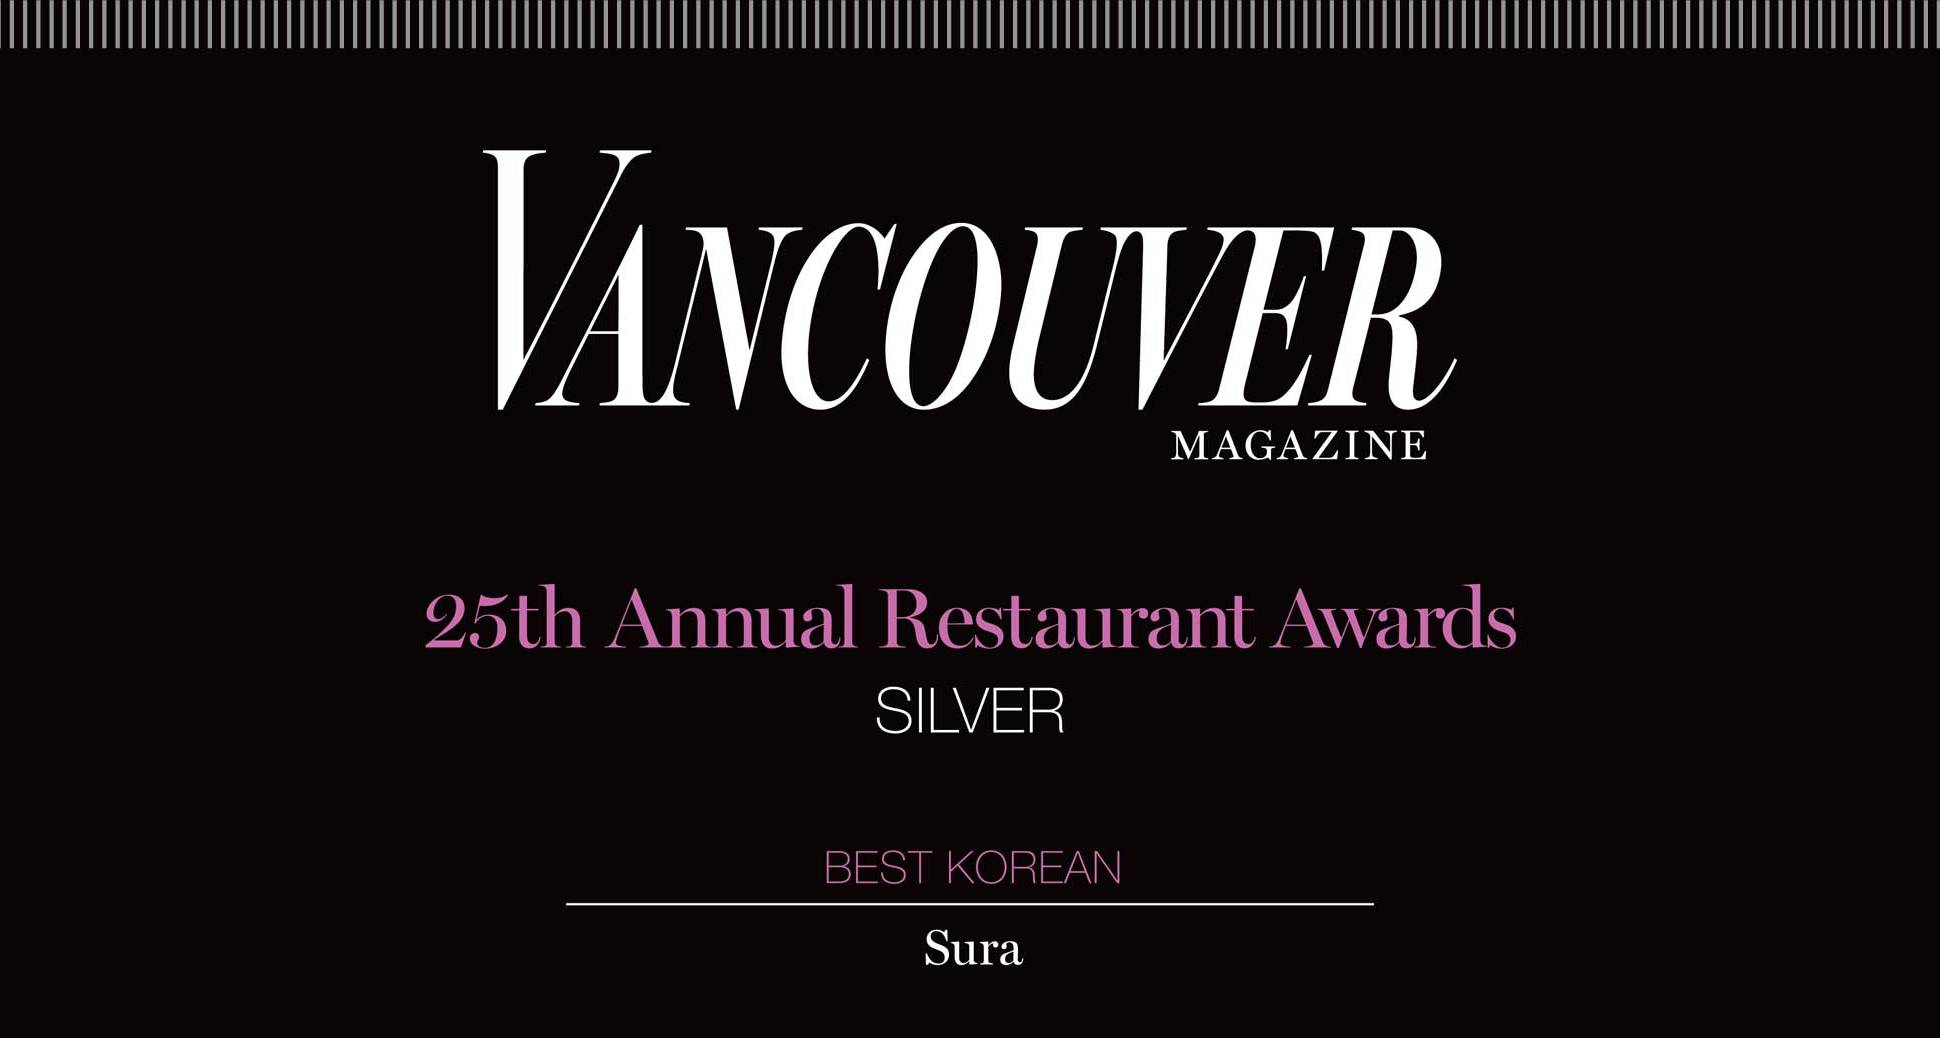 Sura is the best Korean silver winner of Vancouver magazine's 2014 restaurant awards!